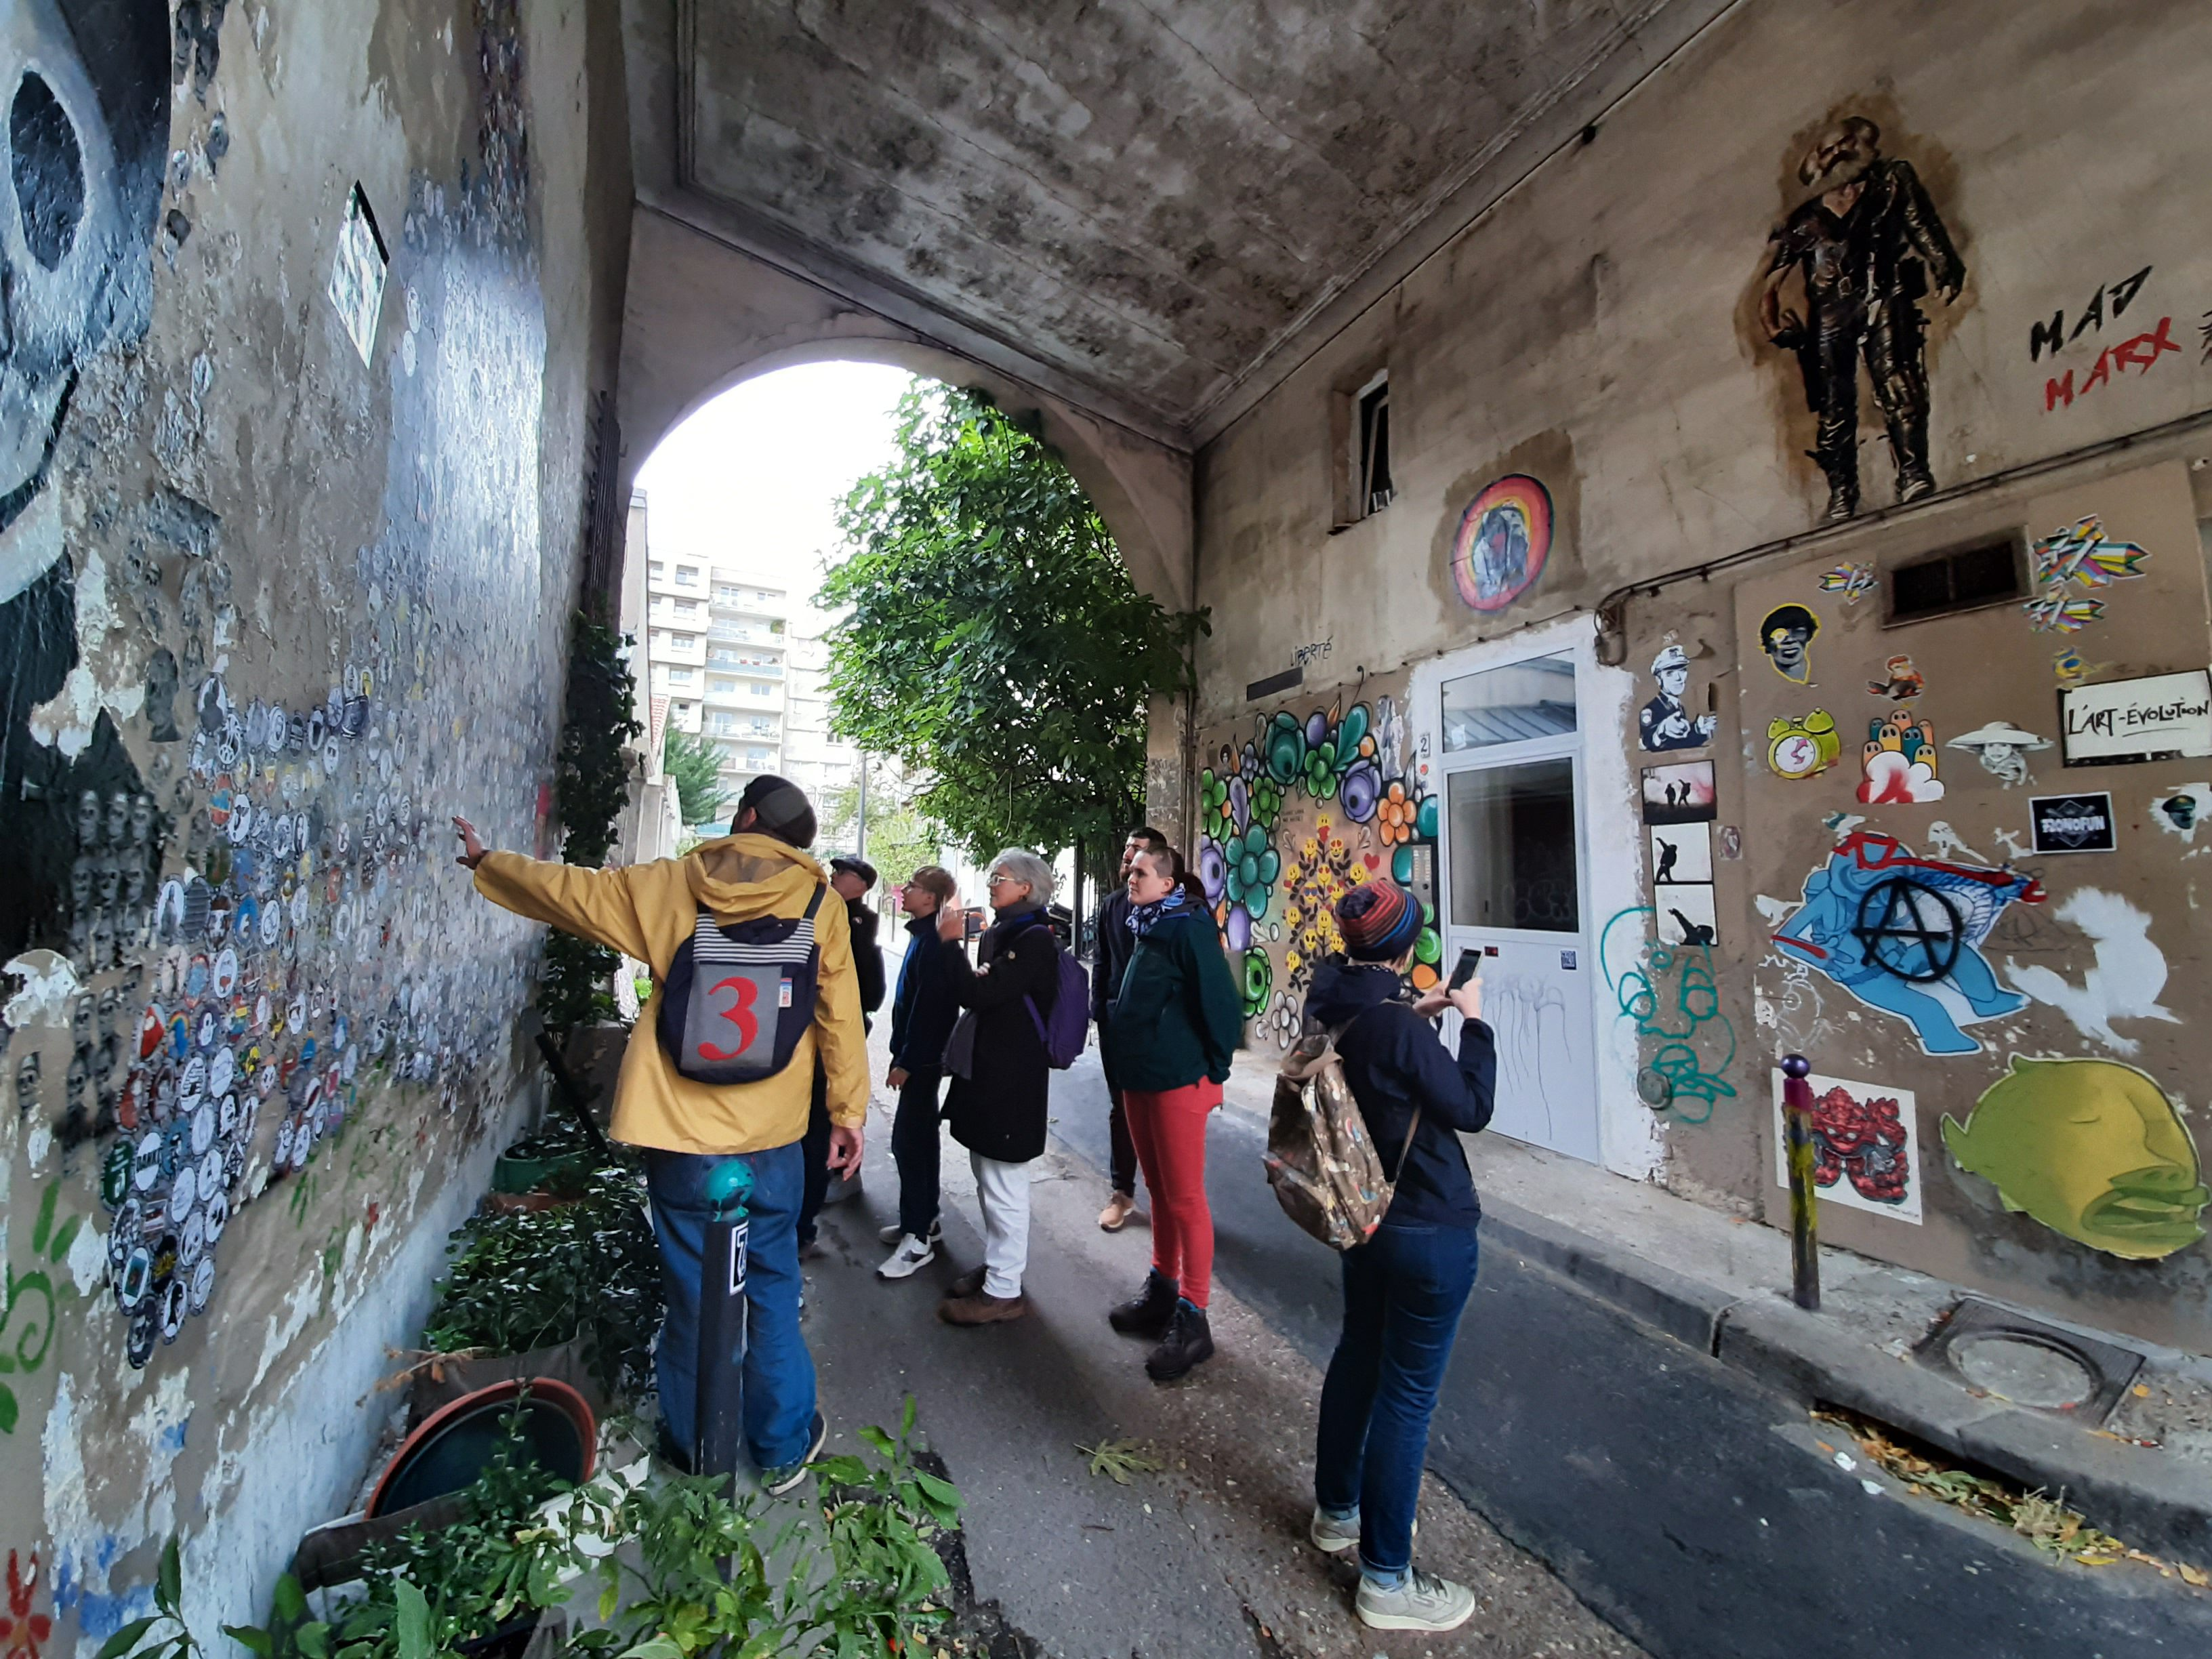 Where to find street art in Paris?